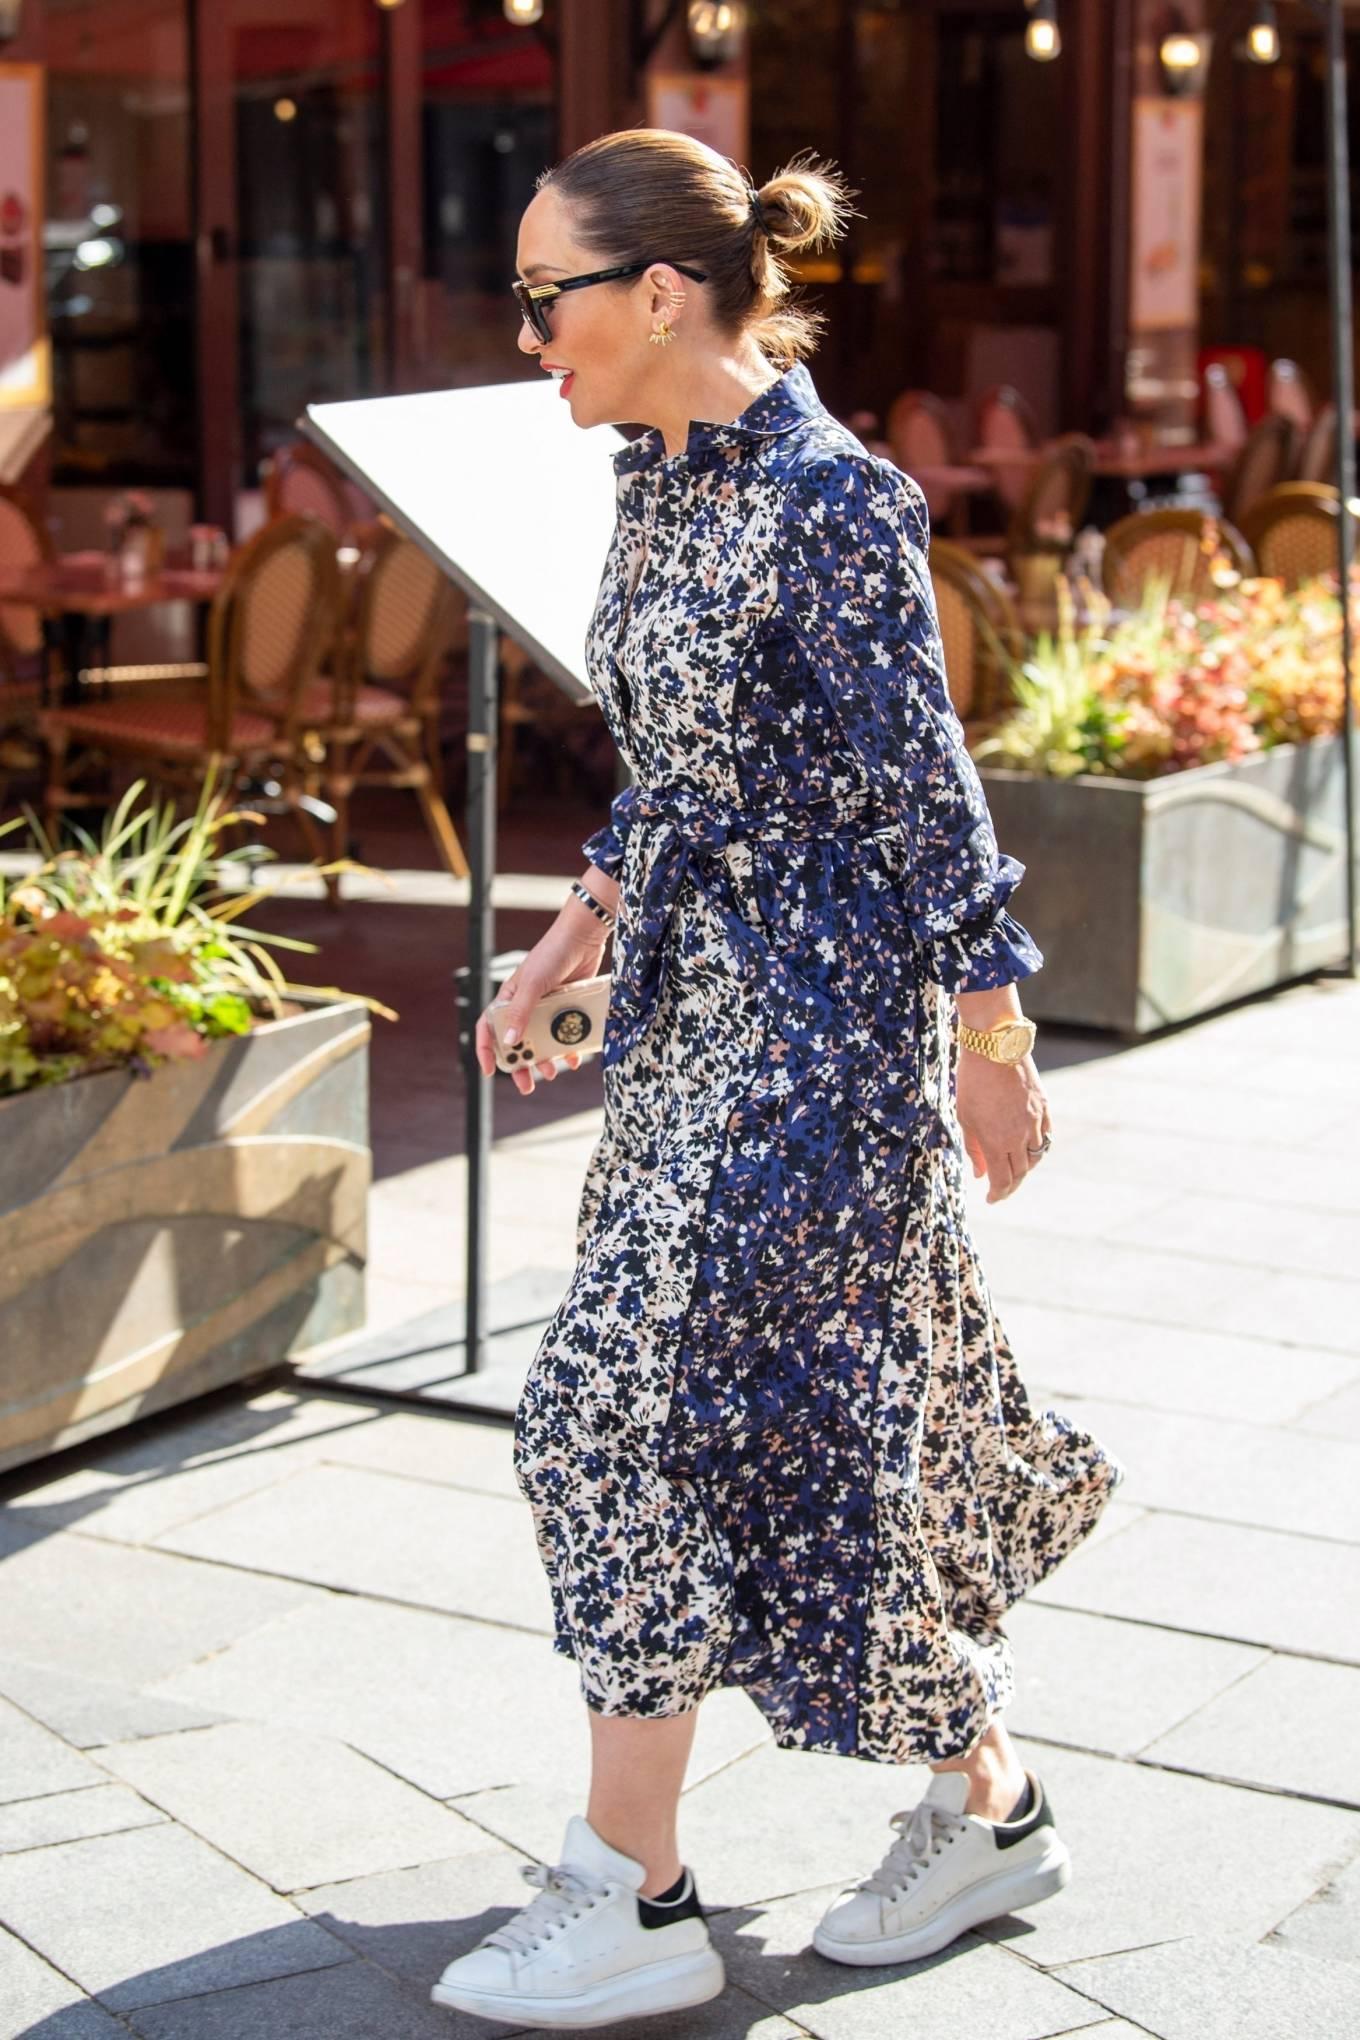 Myleene Klass 2021 : Myleene Klass – In a long summer dress arriving at the Global studios -10